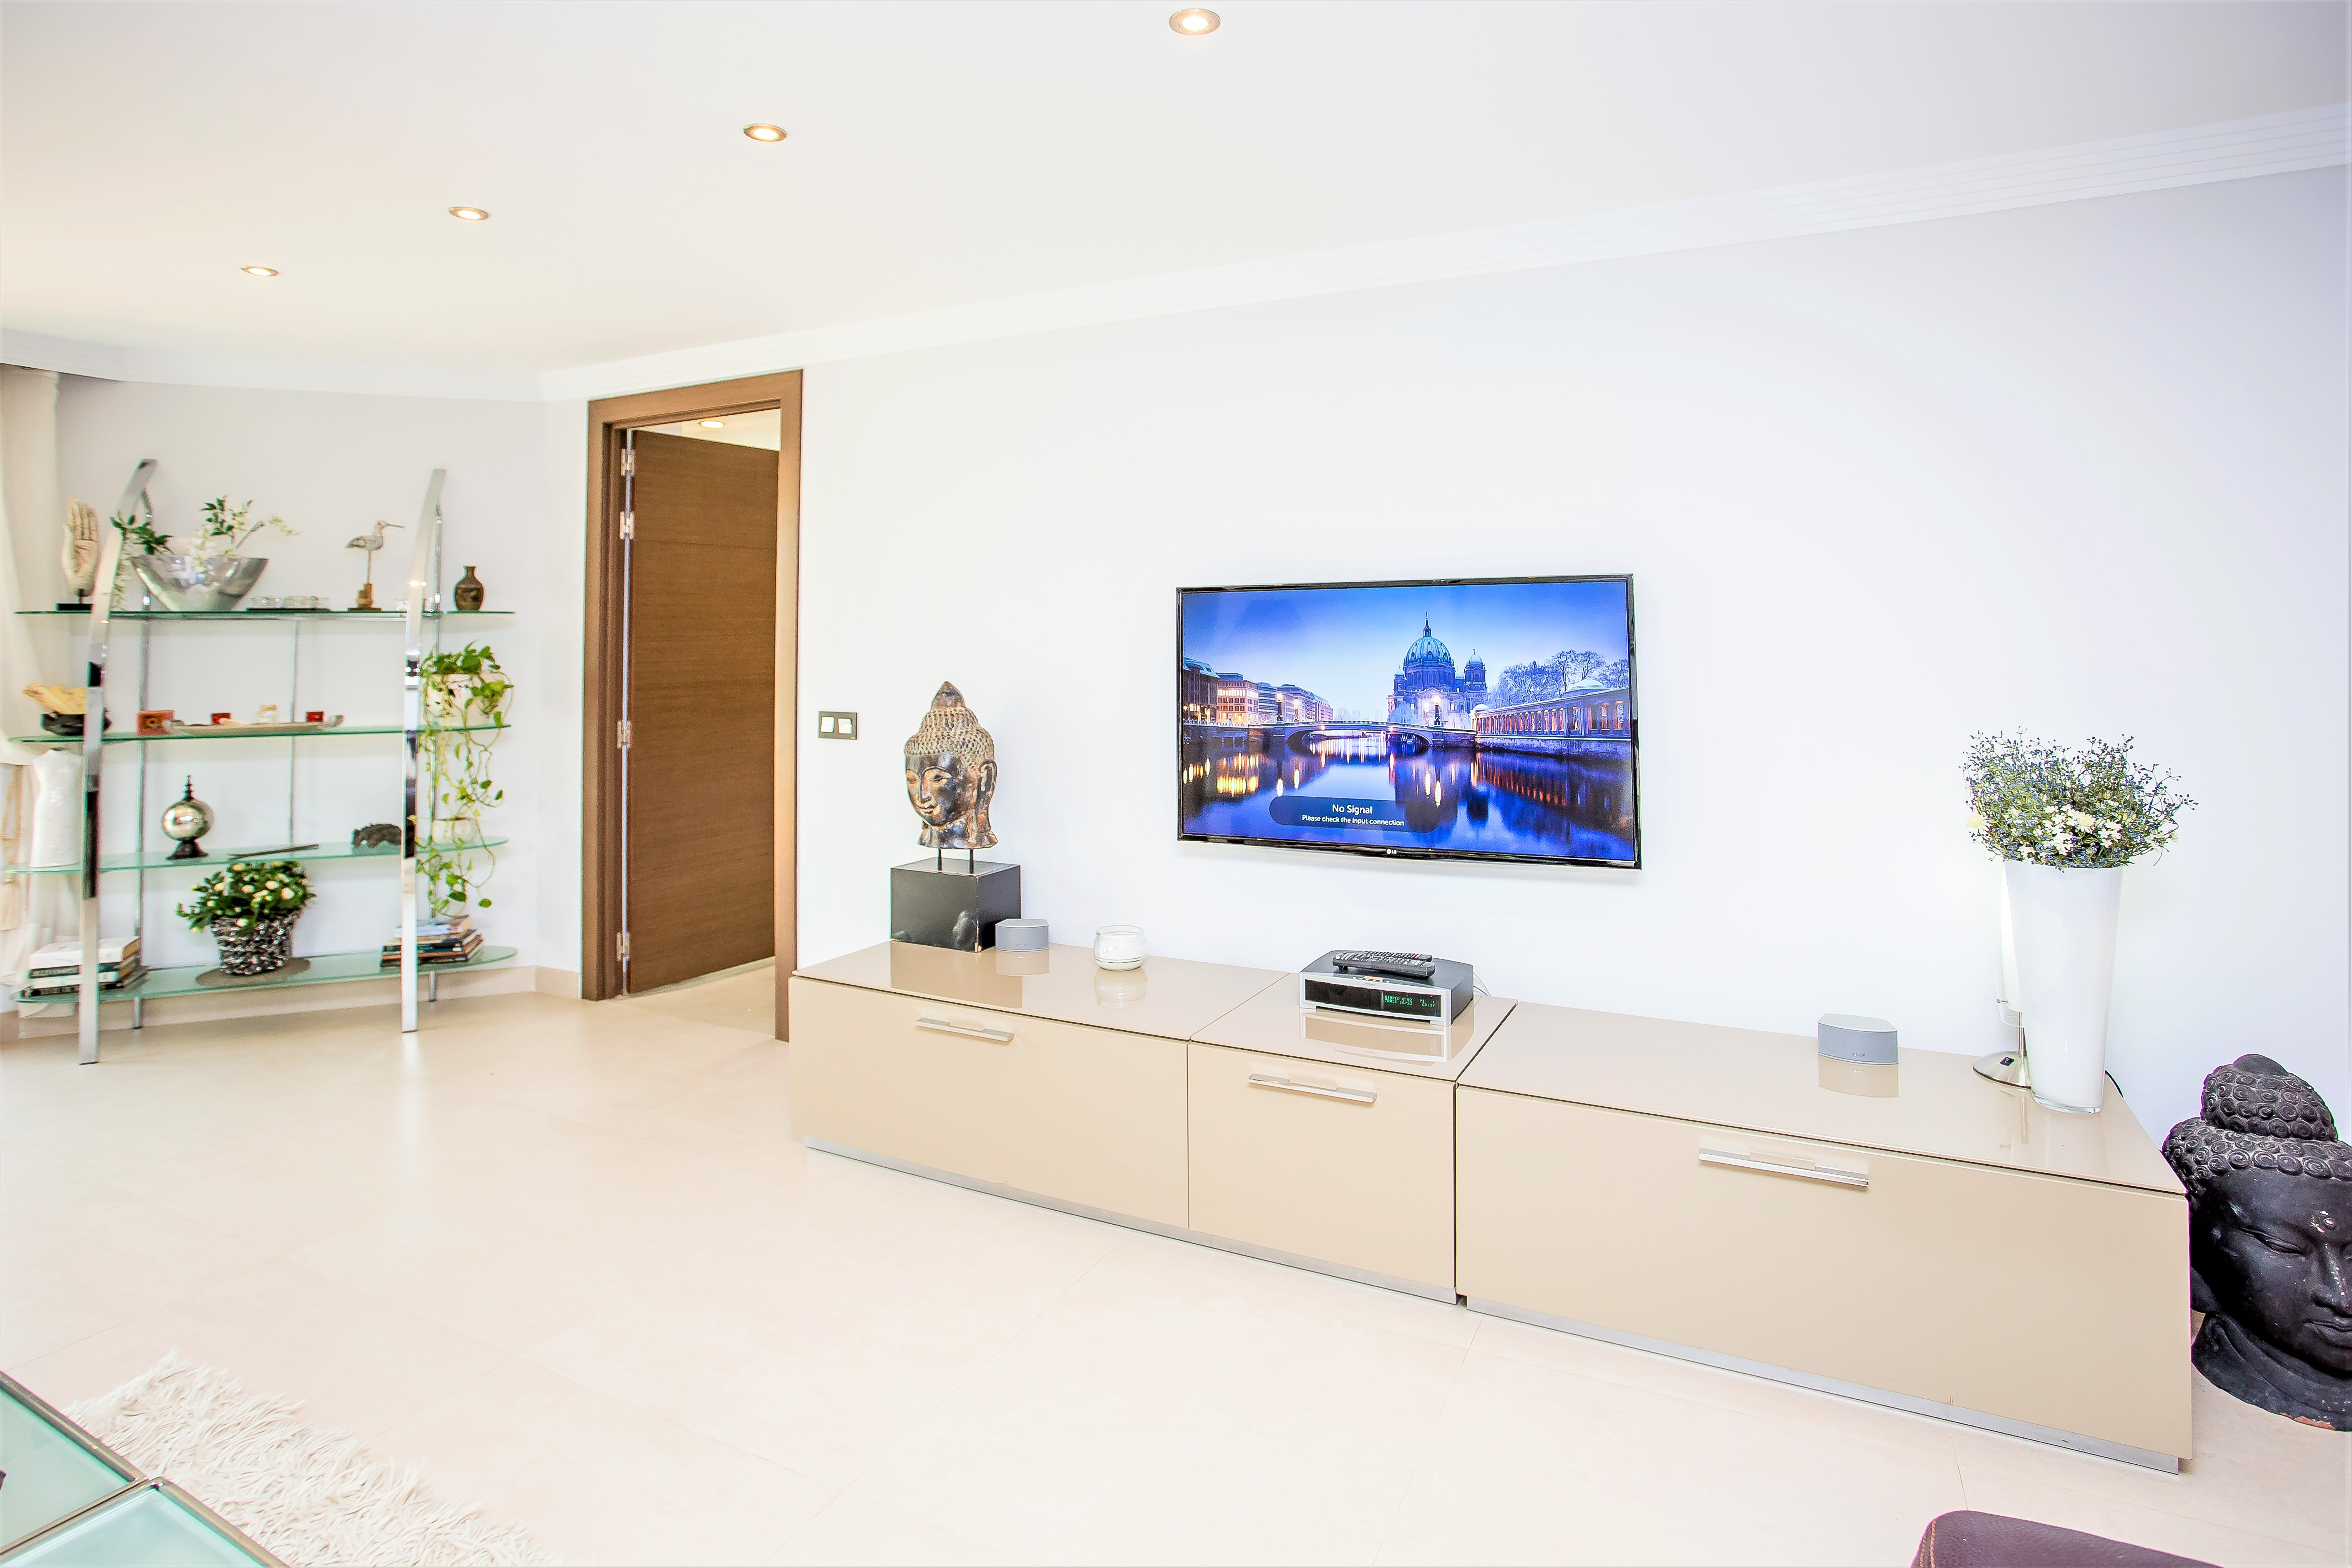 Apartment 8 Bedroom VILLA BY PUERTO BANUS   SEA 5 min                                photo 16876993